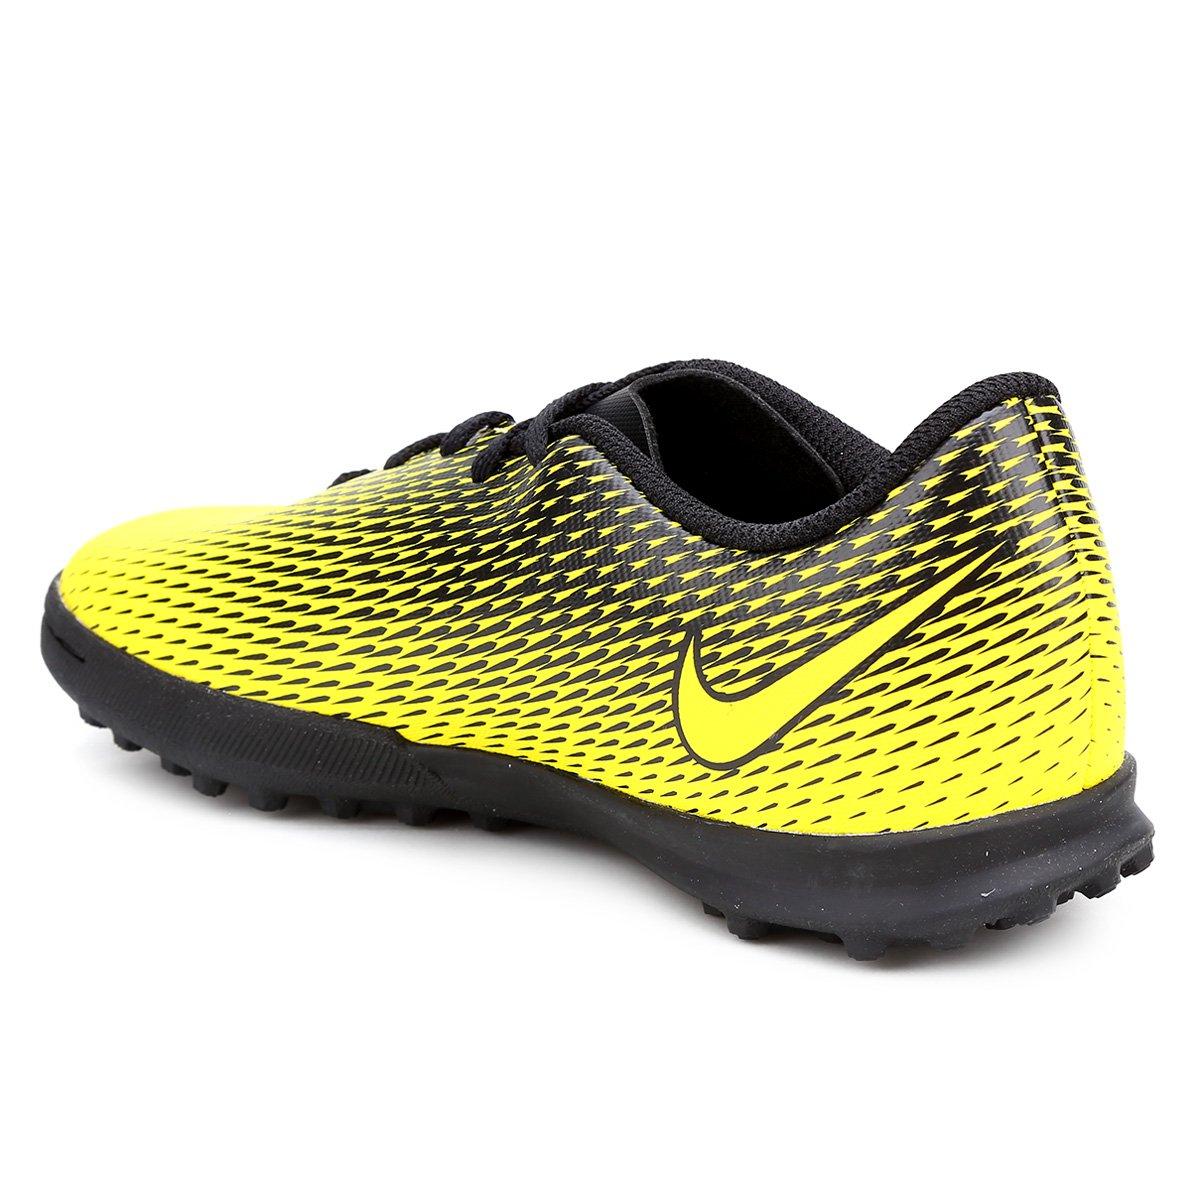 Chuteira Society Infantil Nike Bravata II TF - Amarelo e Preto ... 192fdf81b0cd0